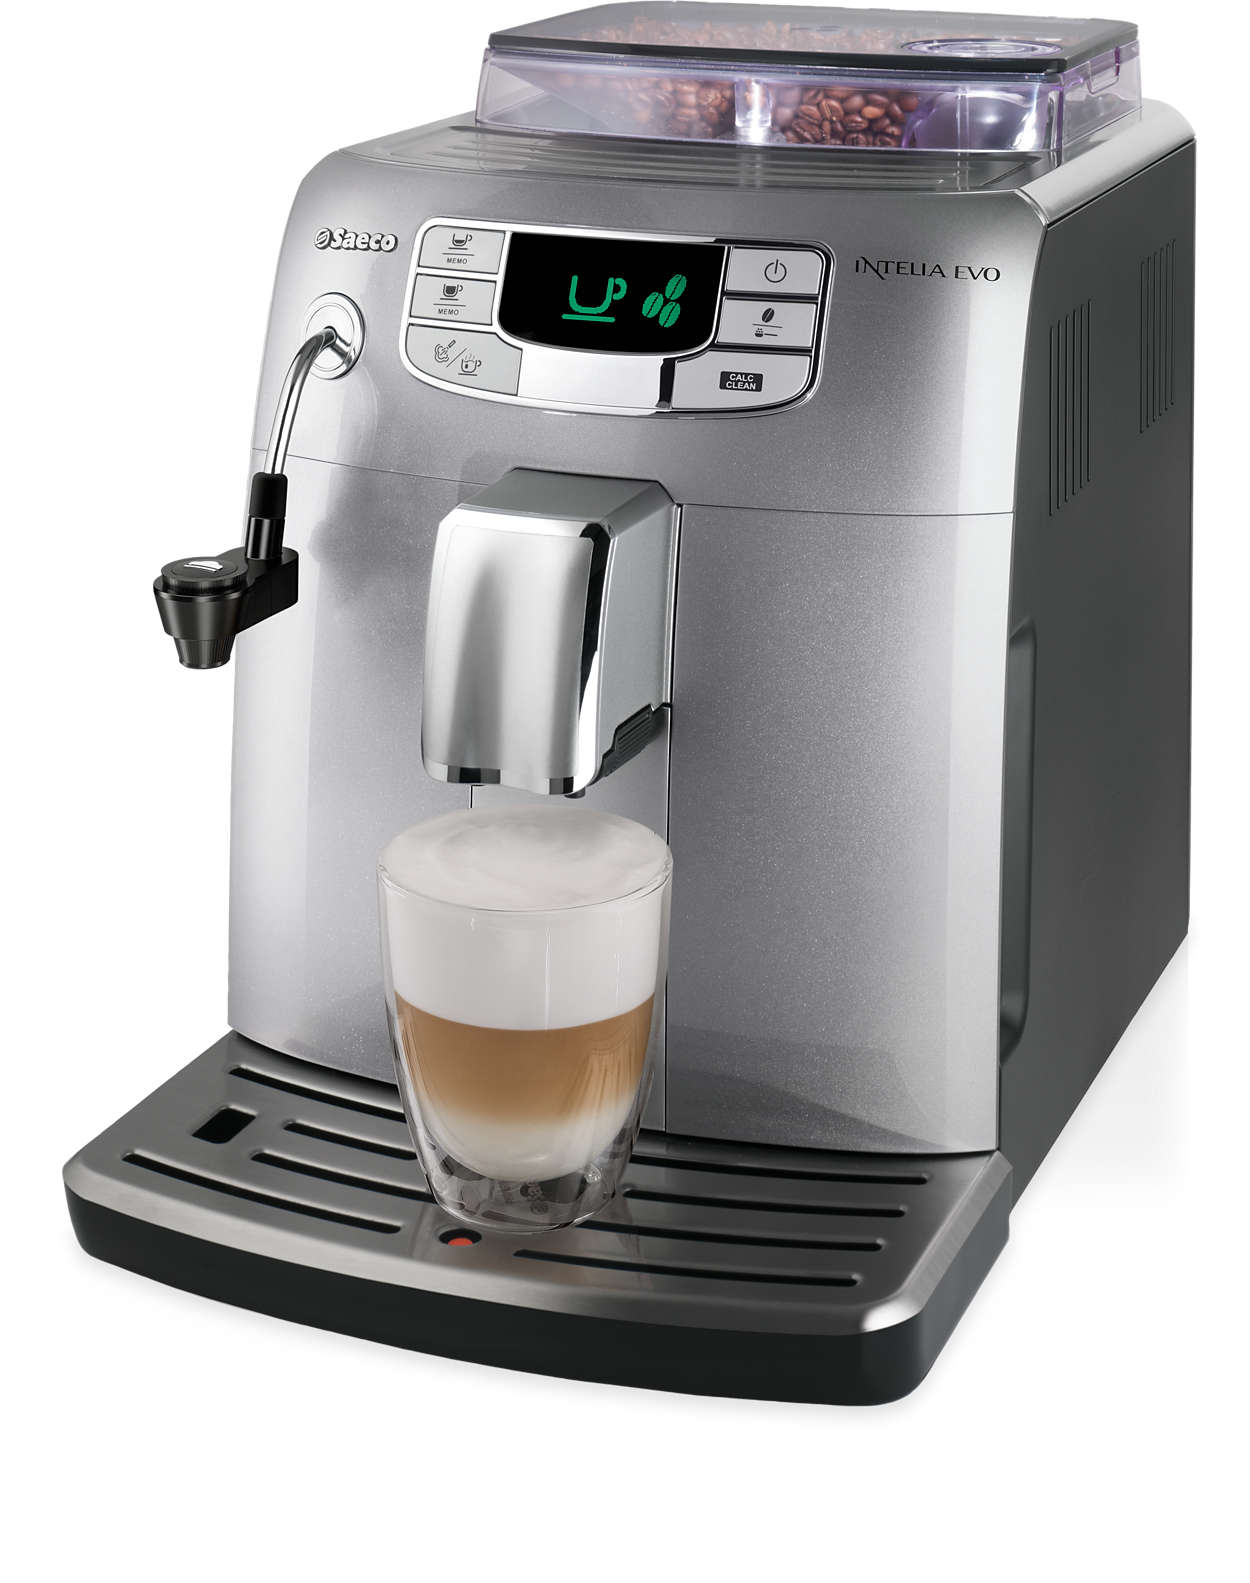 intelia evo kaffeevollautomat hd8752 95 saeco. Black Bedroom Furniture Sets. Home Design Ideas